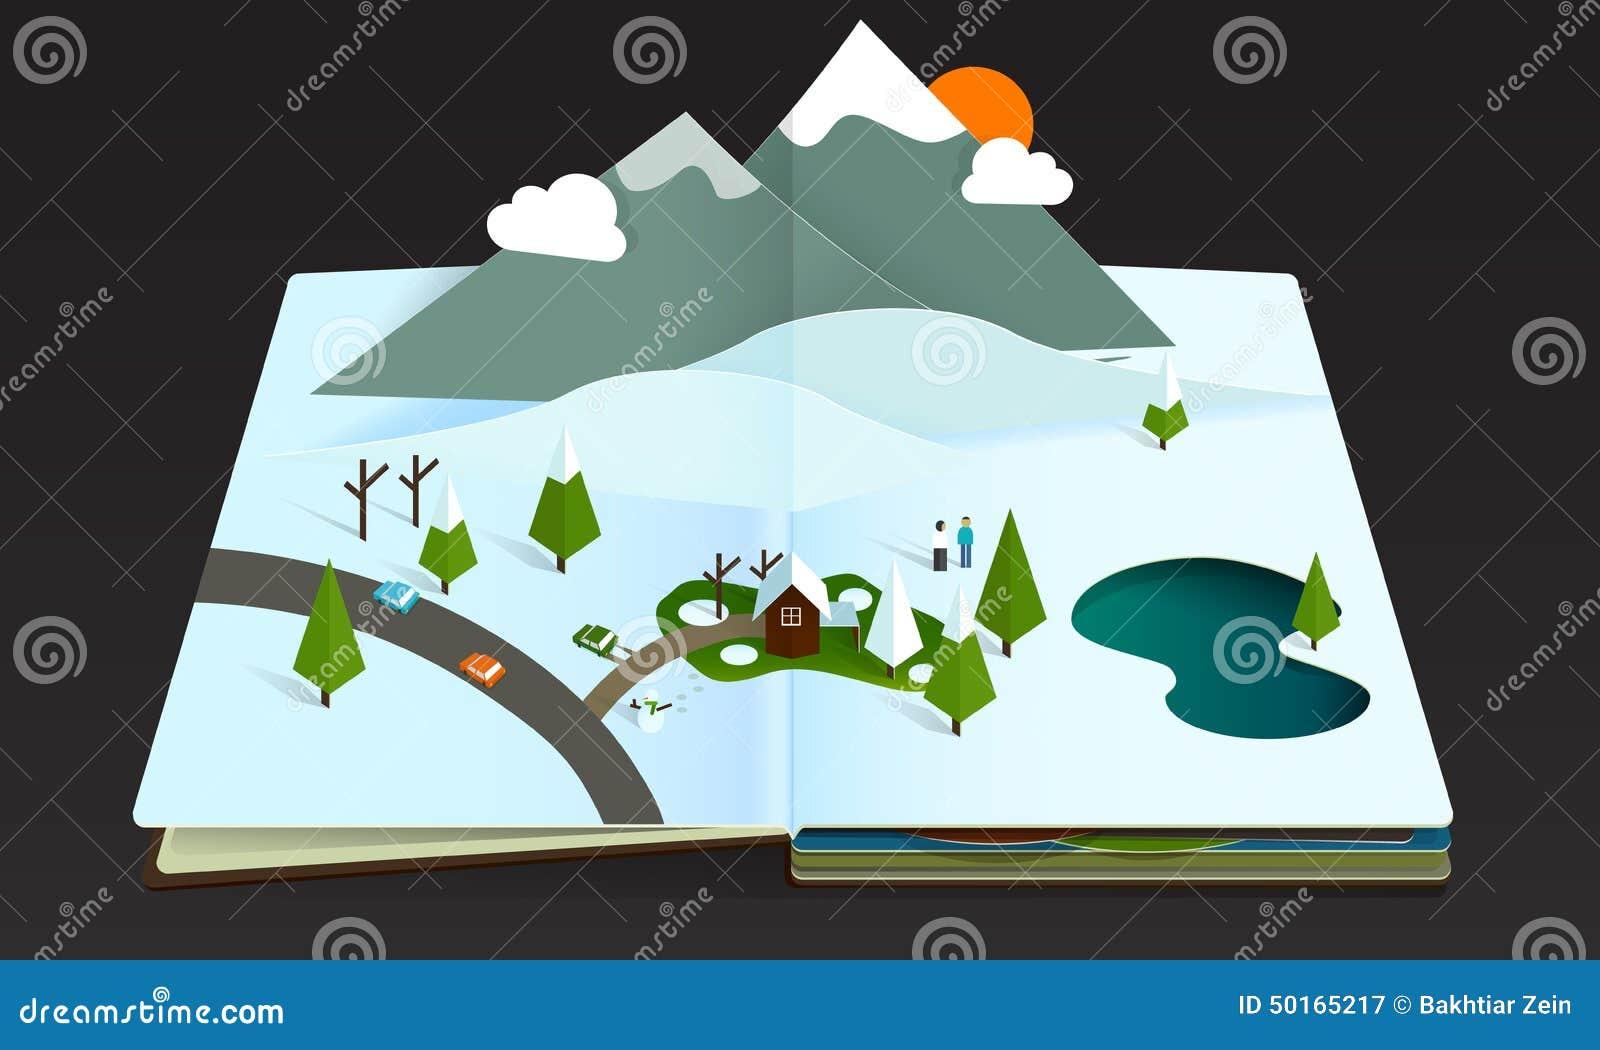 Popup Buchwald Berg Wintwr Schnee Vektor Abbildung Illustration